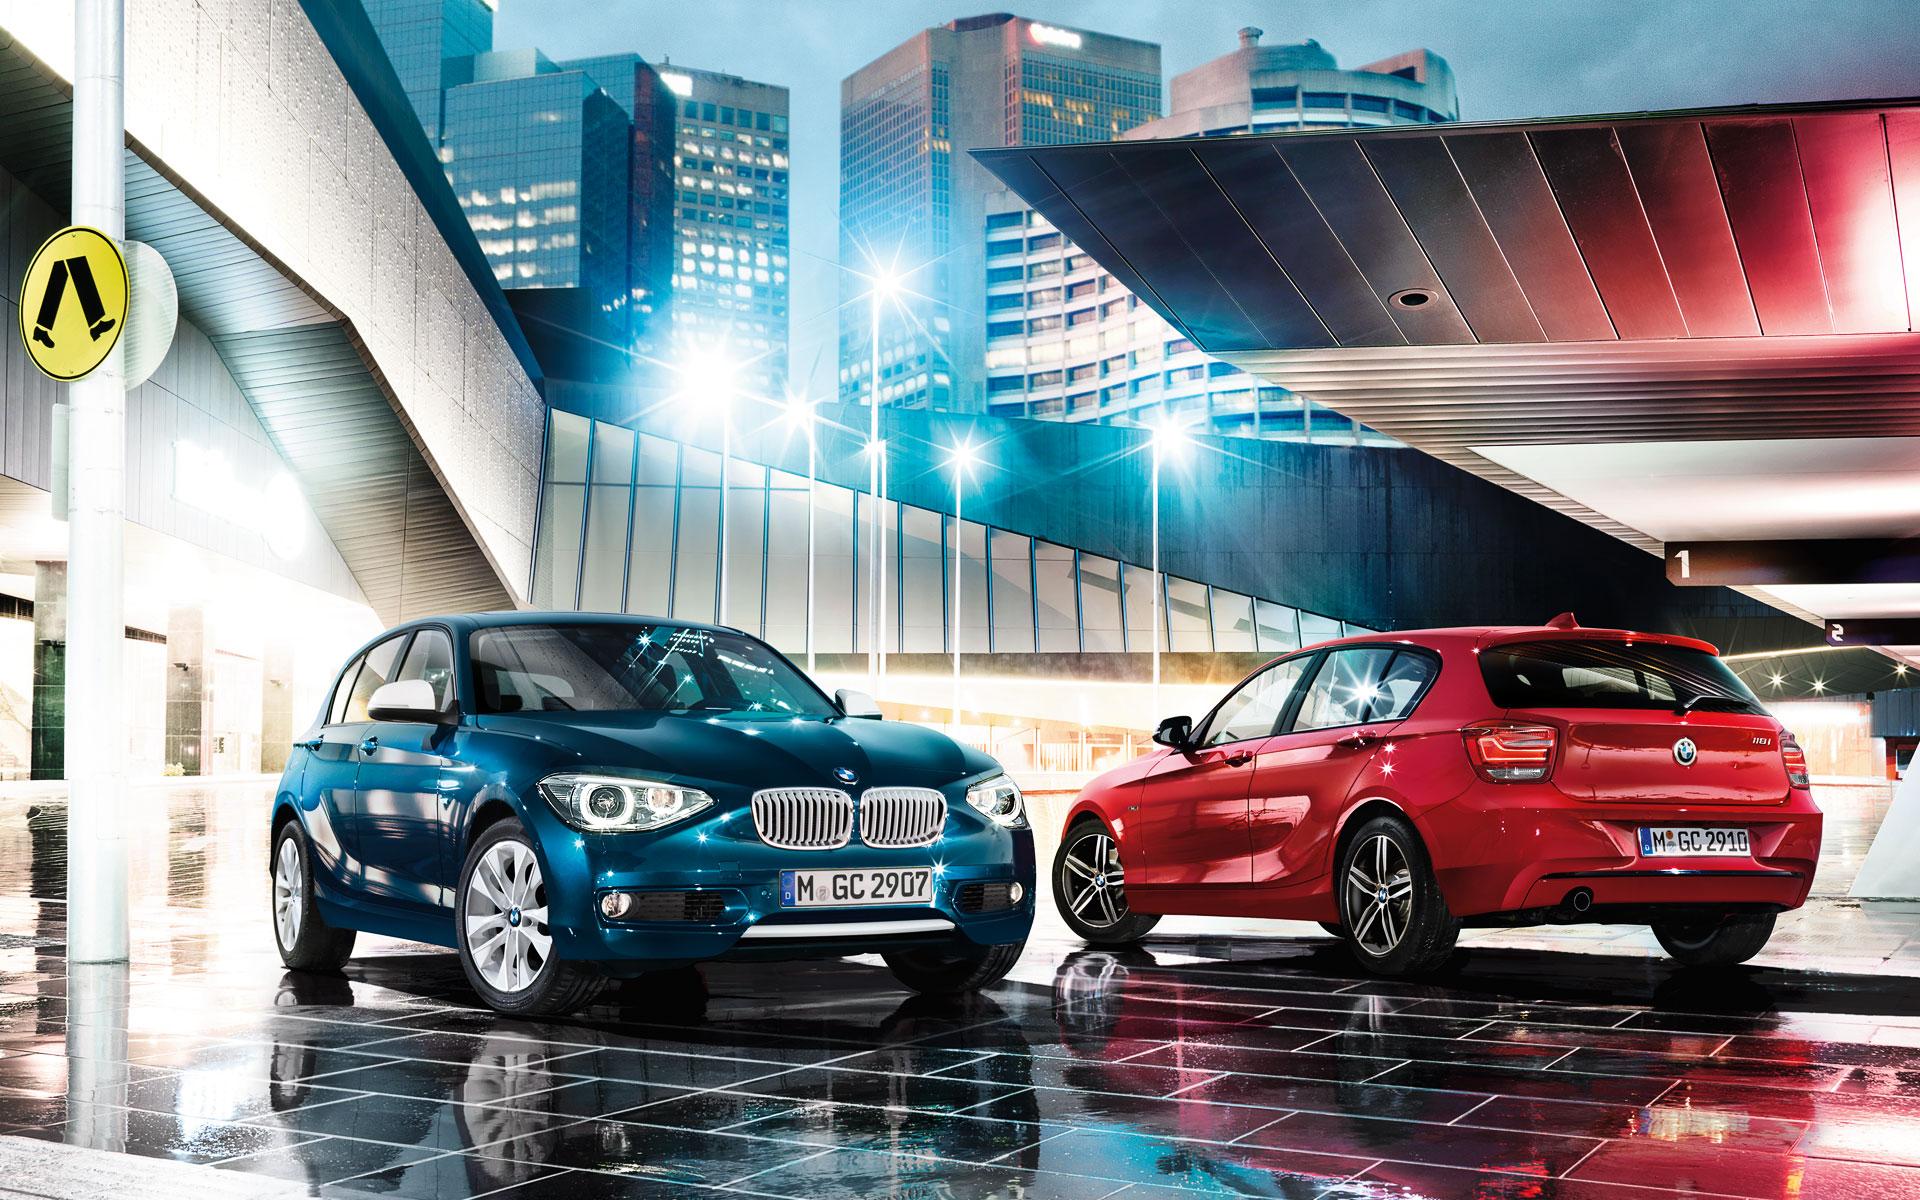 BMW_1series_wallpaper_02_1920_1200.jpg.resource.1373895746785.jpg